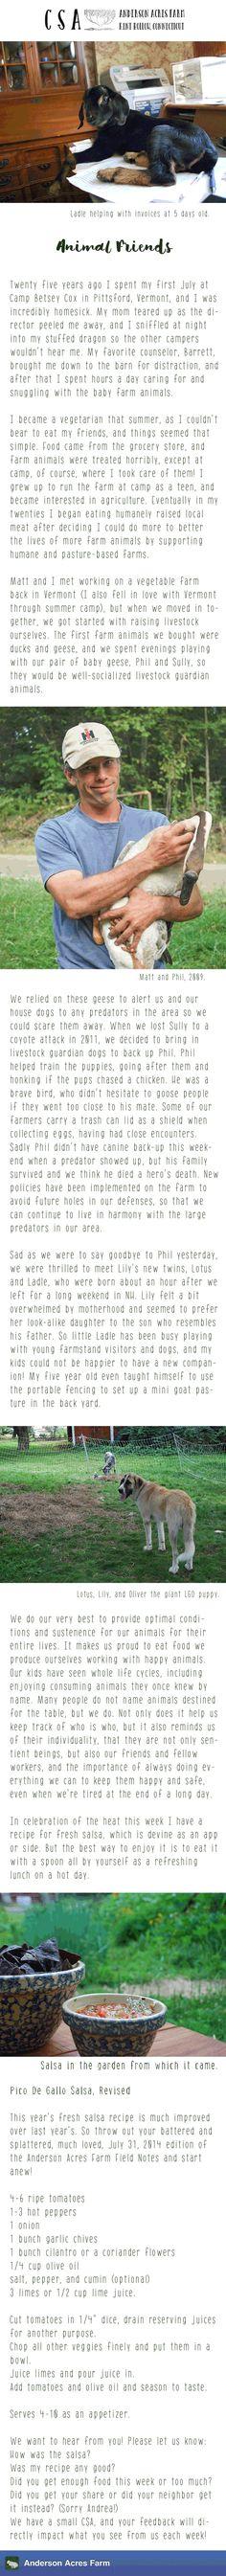 #CSA Note July 30th: Animal Friends #Food #Ag #OrganicFarm #Connecticut #Kent #Organics #FarmFresh #FarmToPlate #Animals #Goats #YearRoundFarms #AgBlog #Recipes #FarmLife #KnowFarmsKnowFoods #Farmers #CTFarms